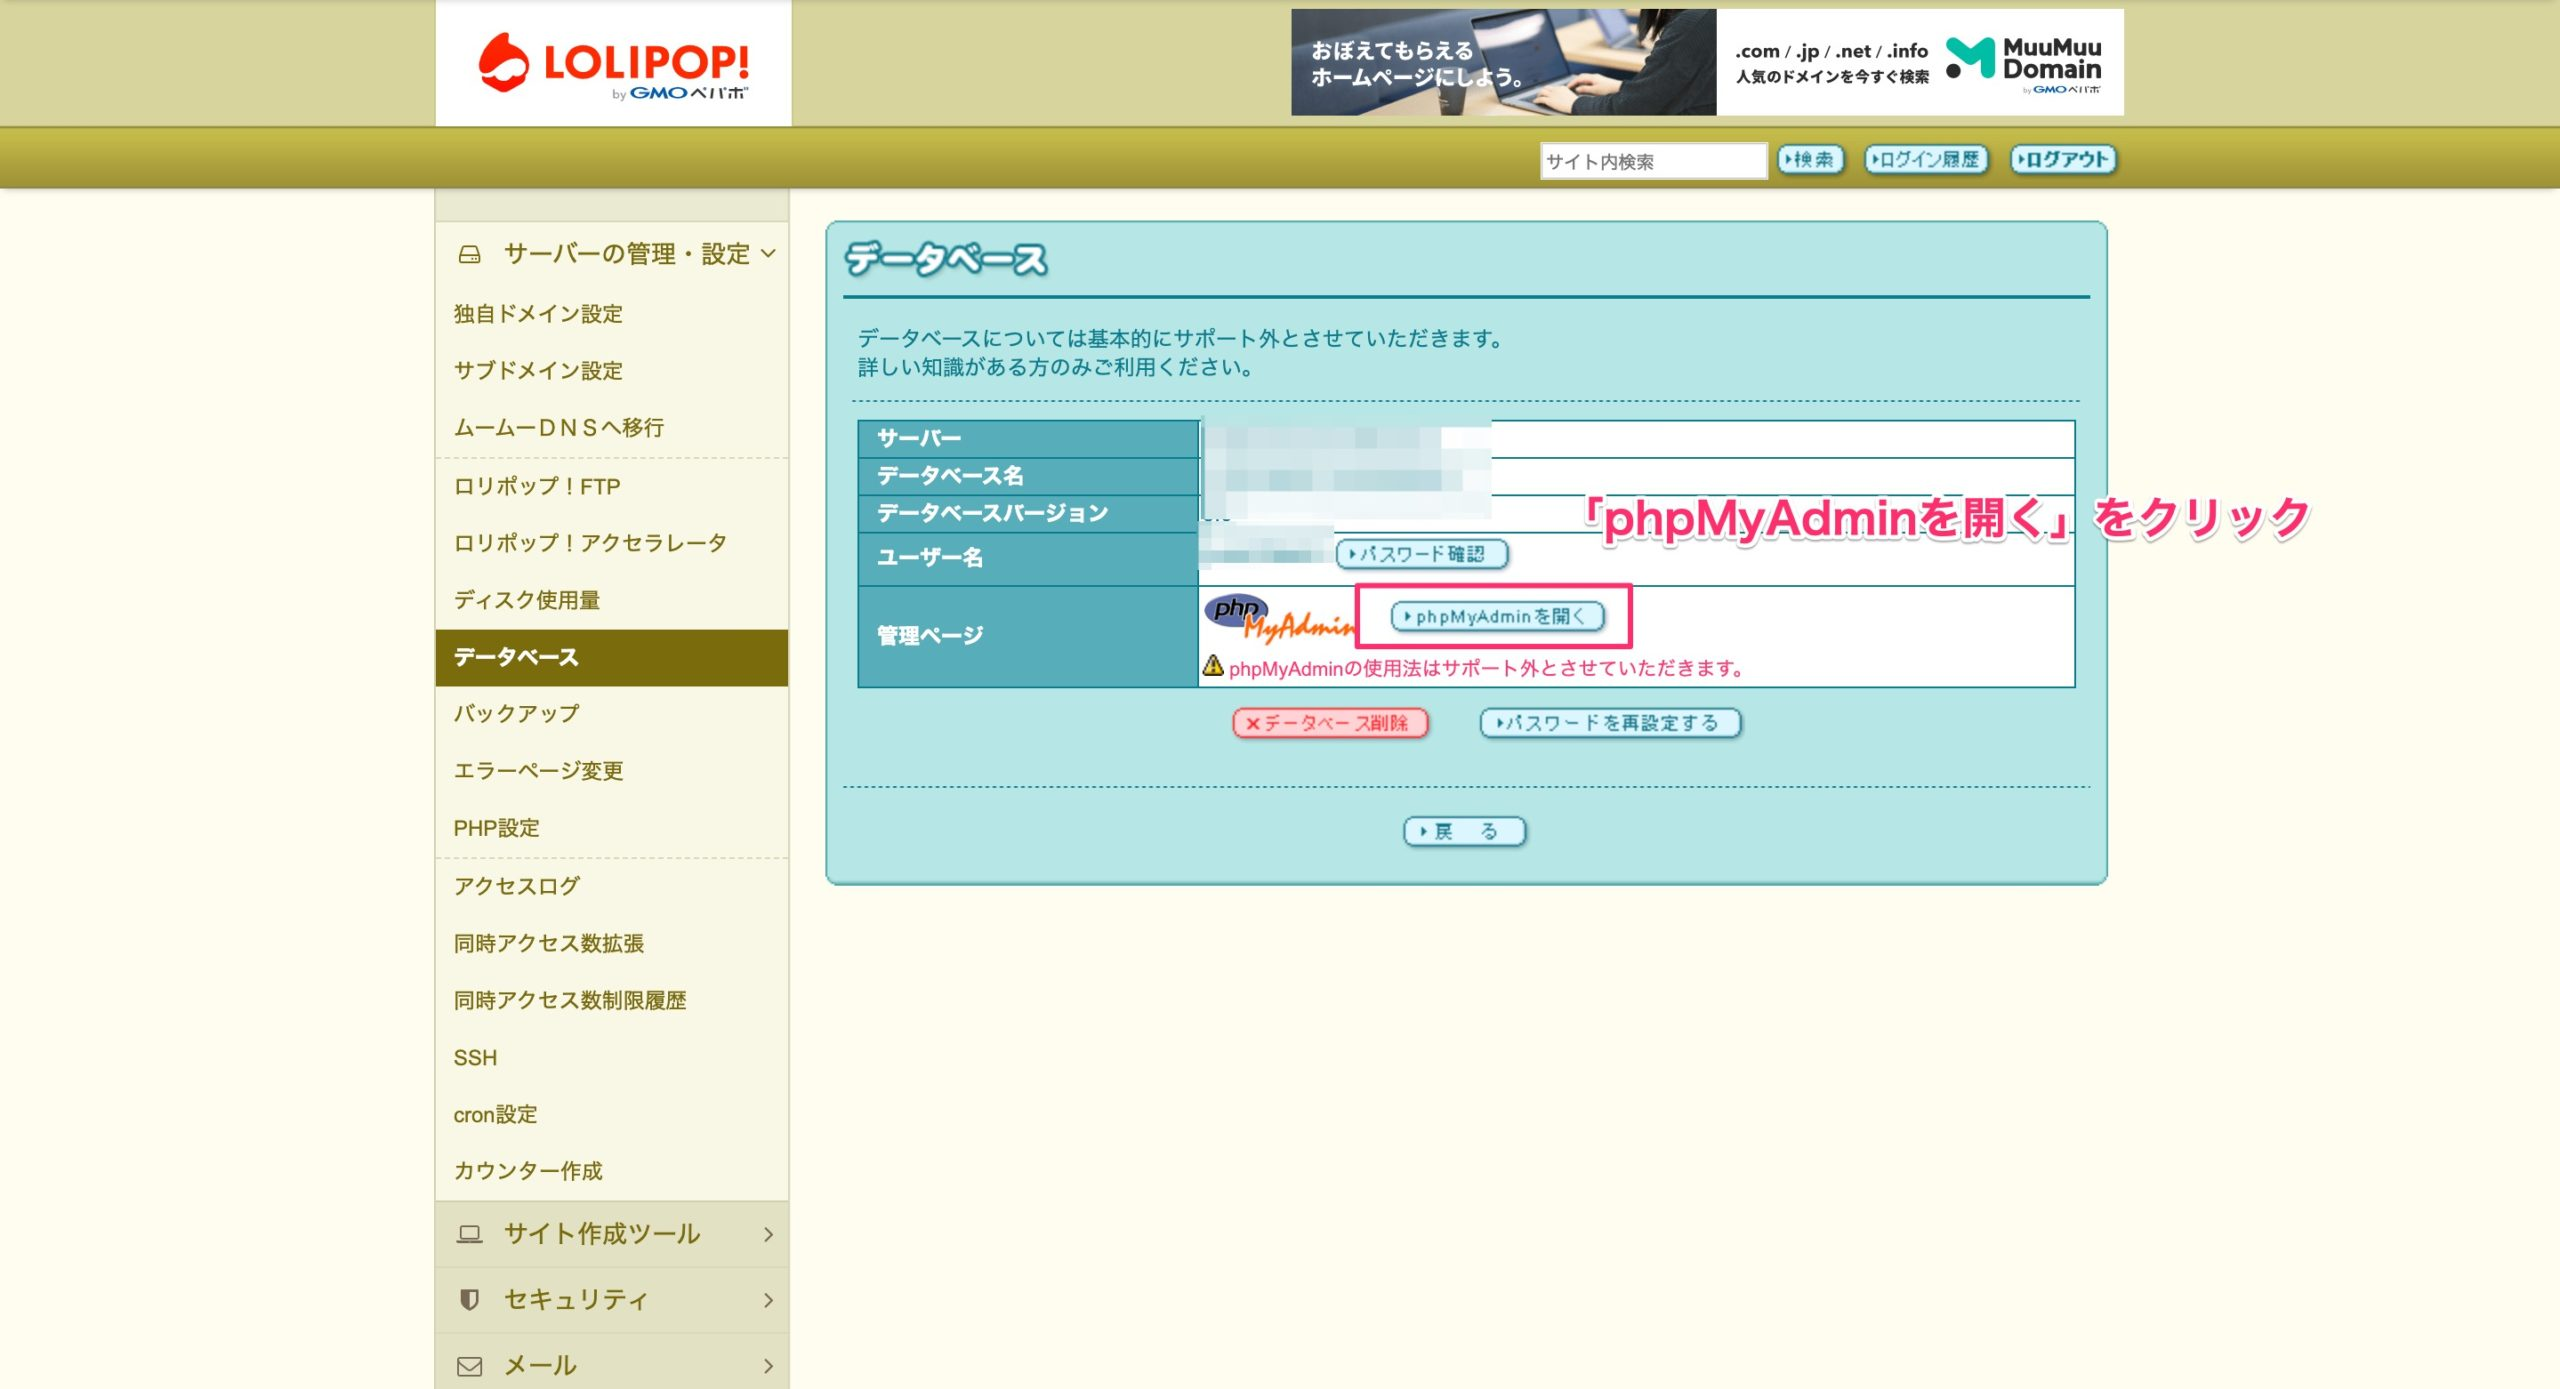 phpMyAdminを開くボタン